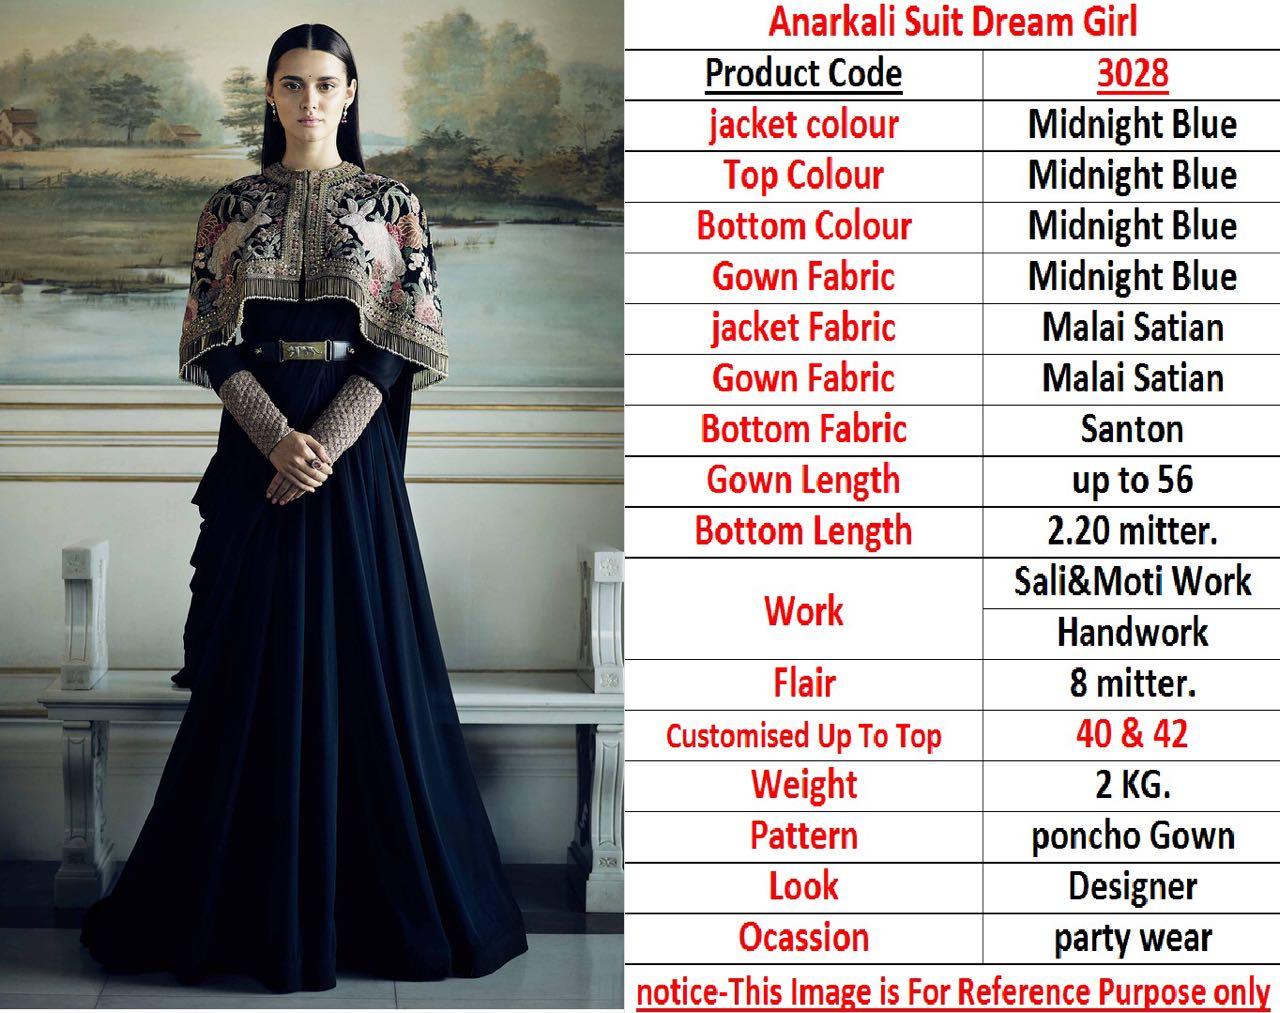 Anarkali Suit Dream Girl 3028